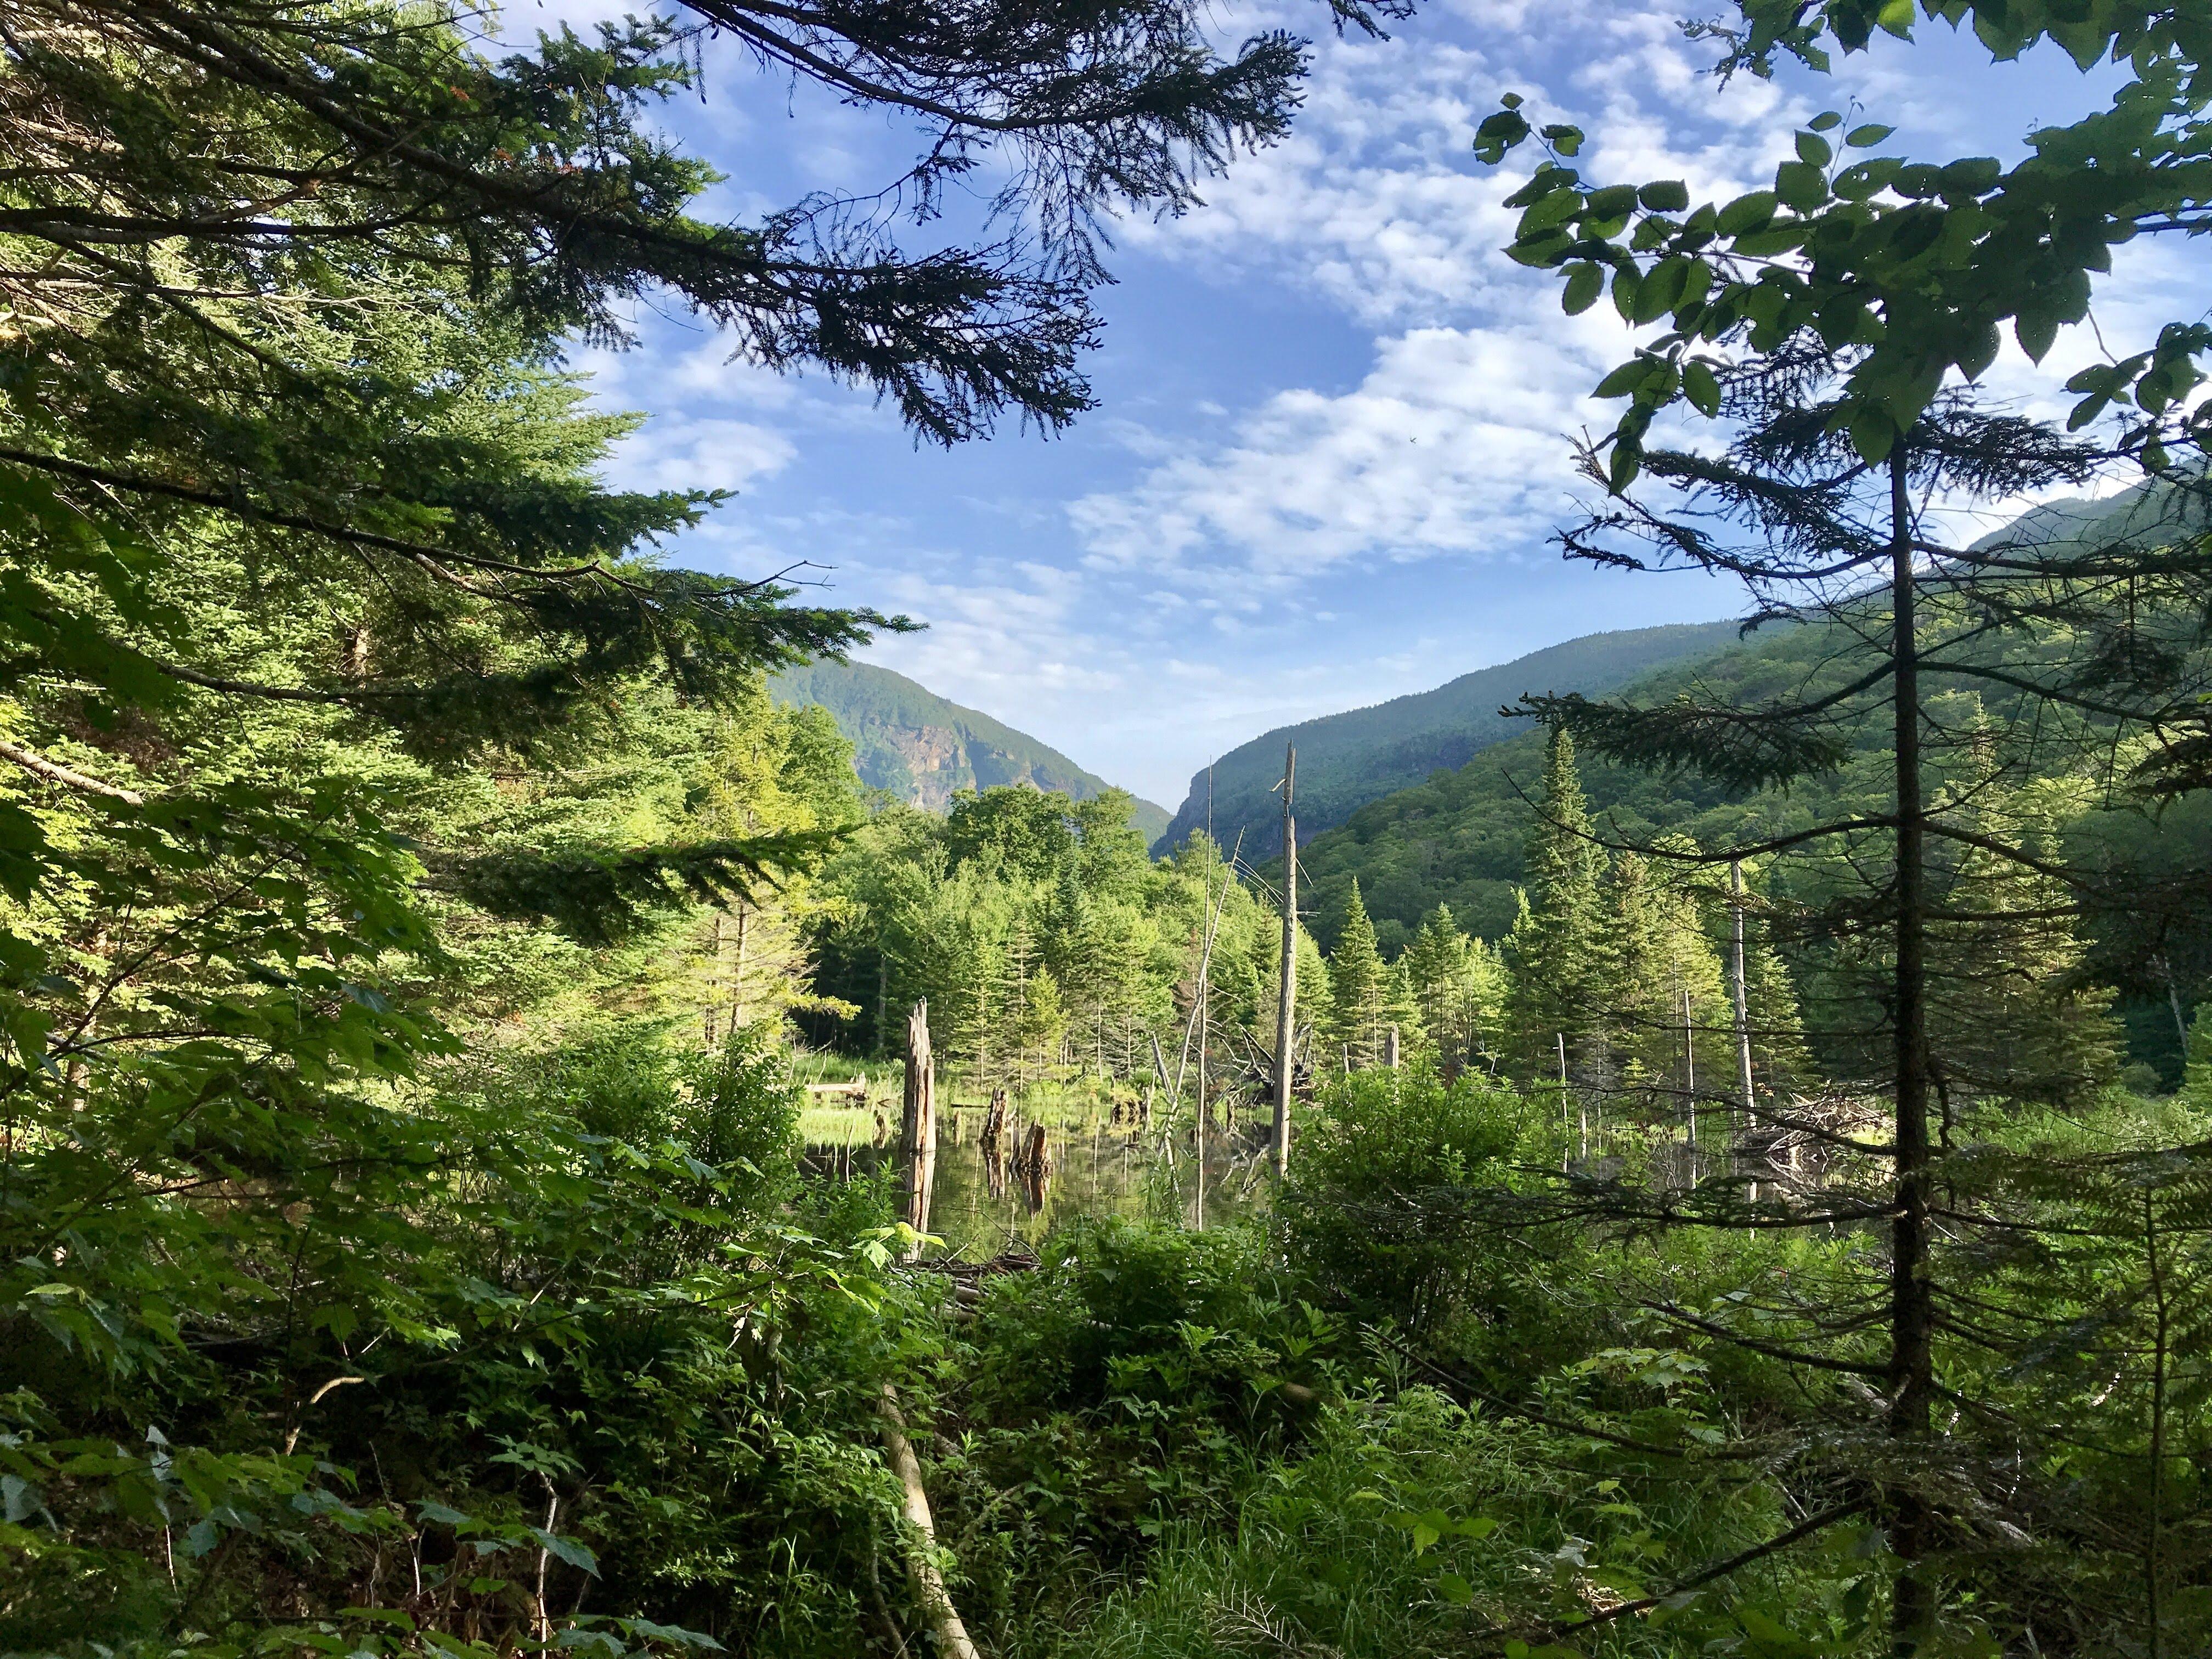 A Day Hiker Turned Thru-Hiker